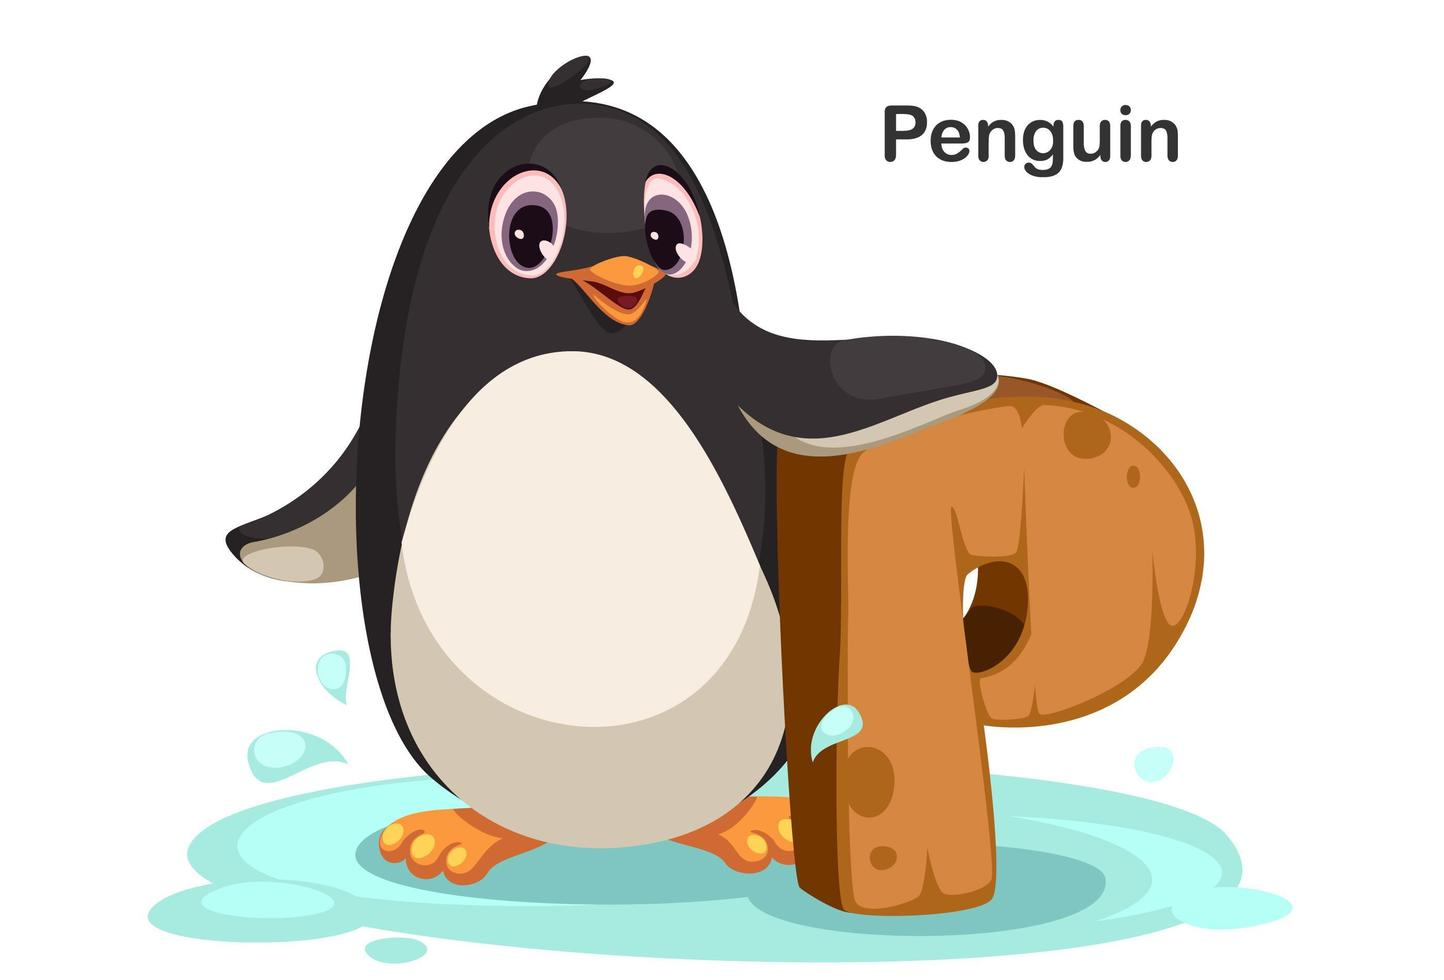 P for Penguin vector